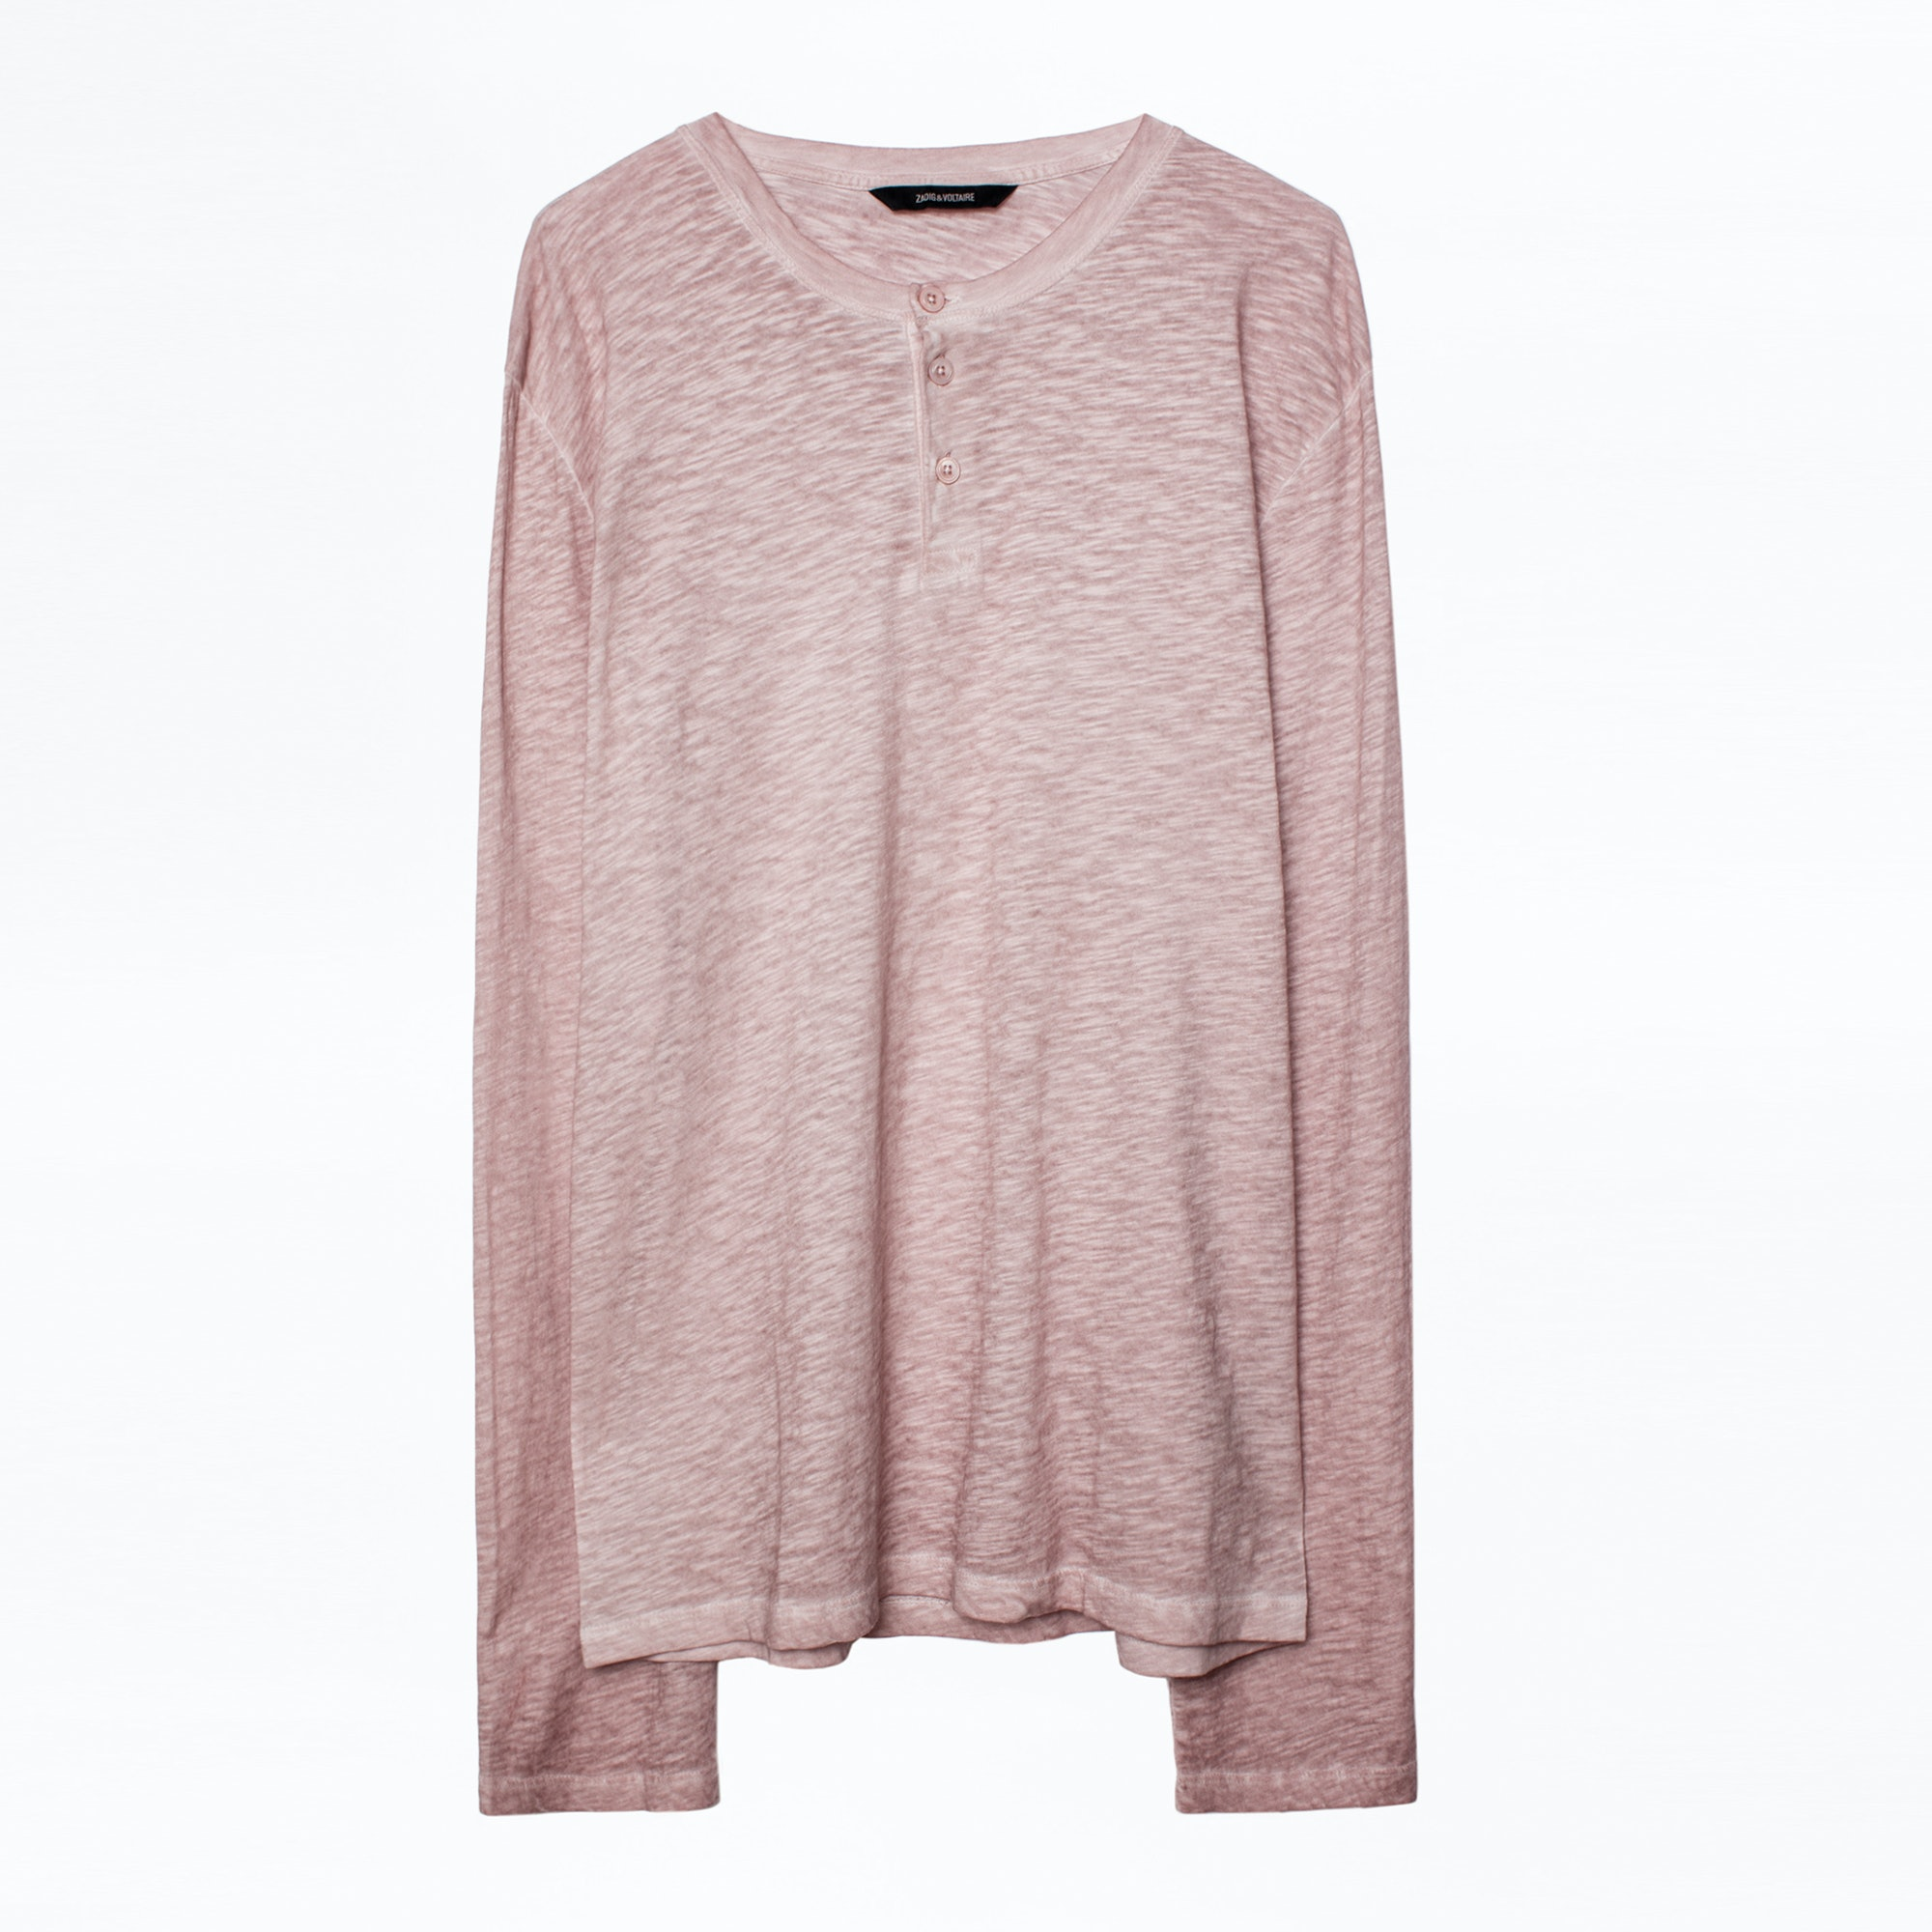 T-shirt Tribu - Taille L  - Zadig & Voltaire - Modalova